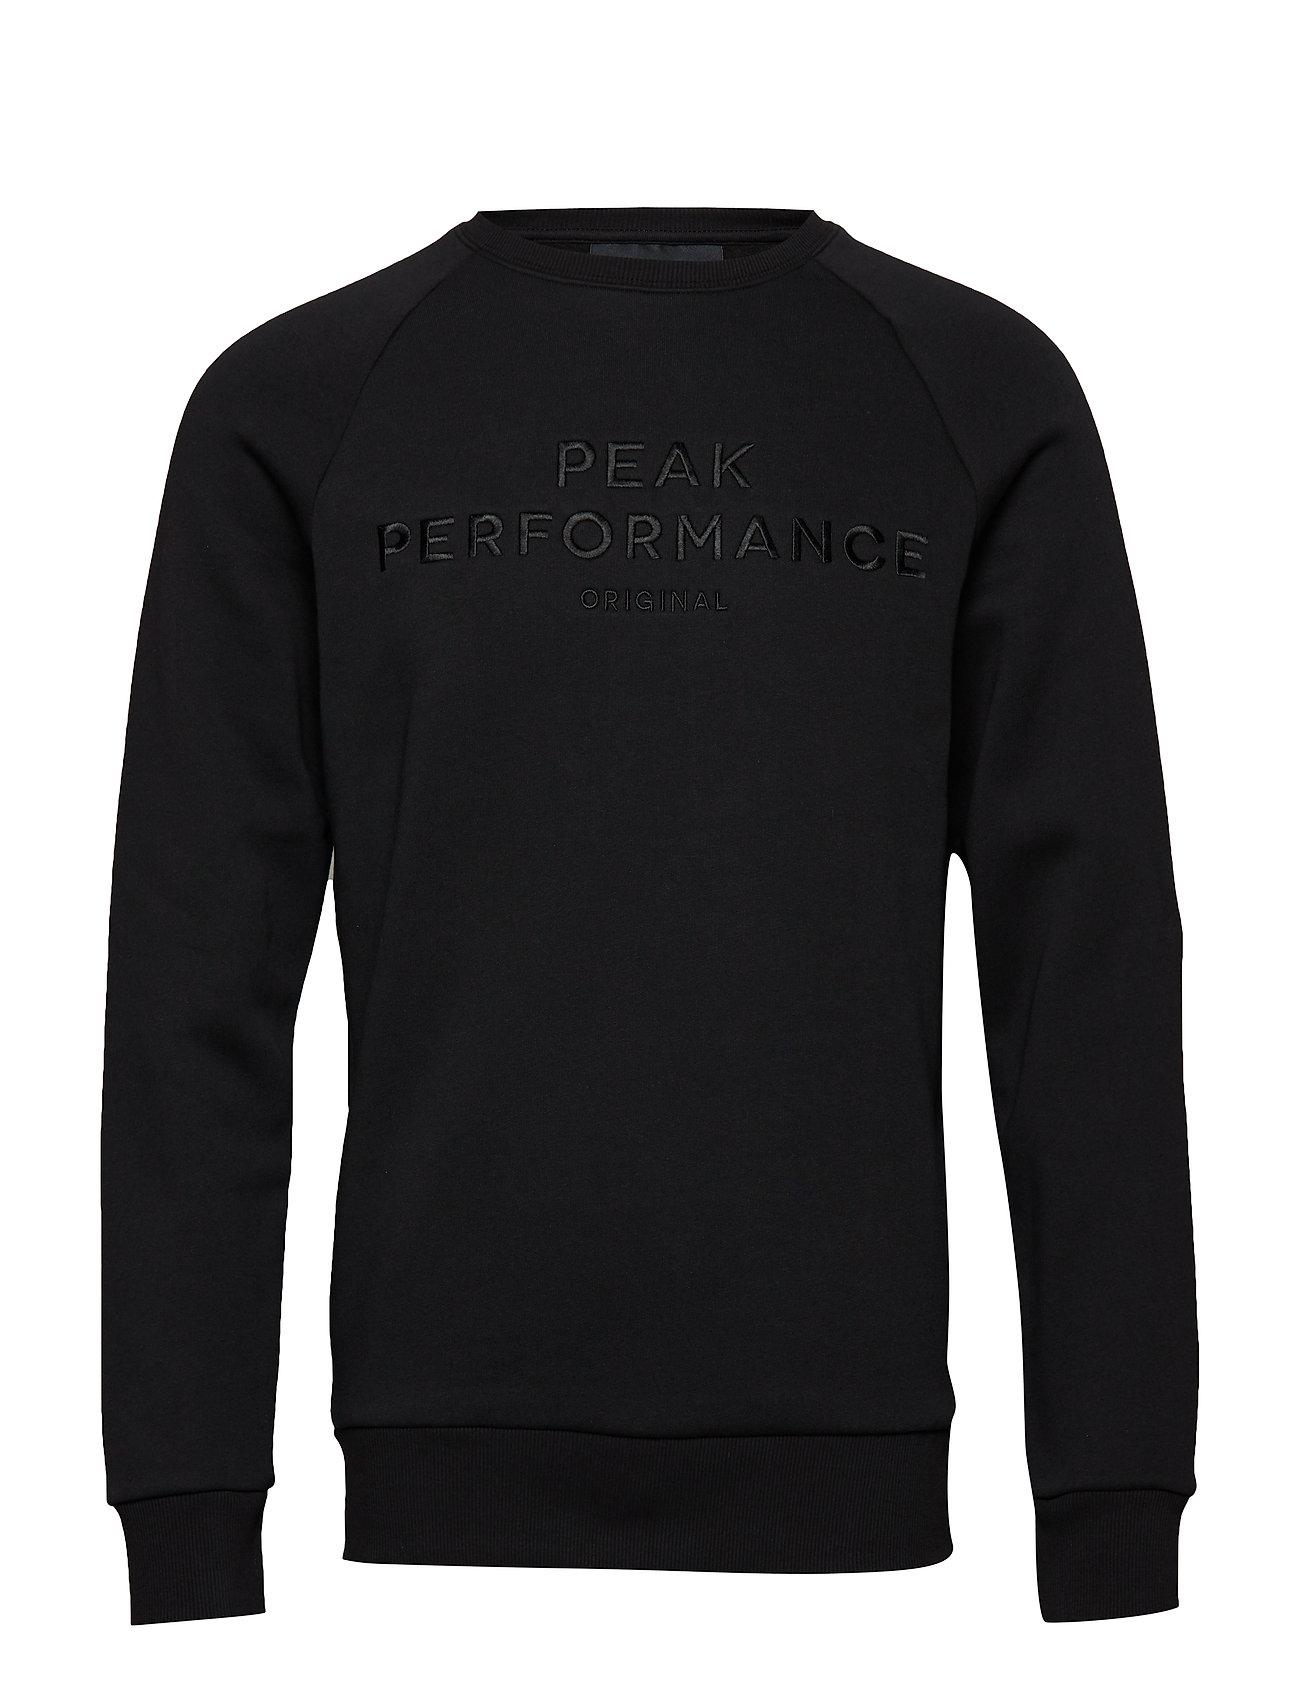 Peak Performance ORIGI CR - BLACK